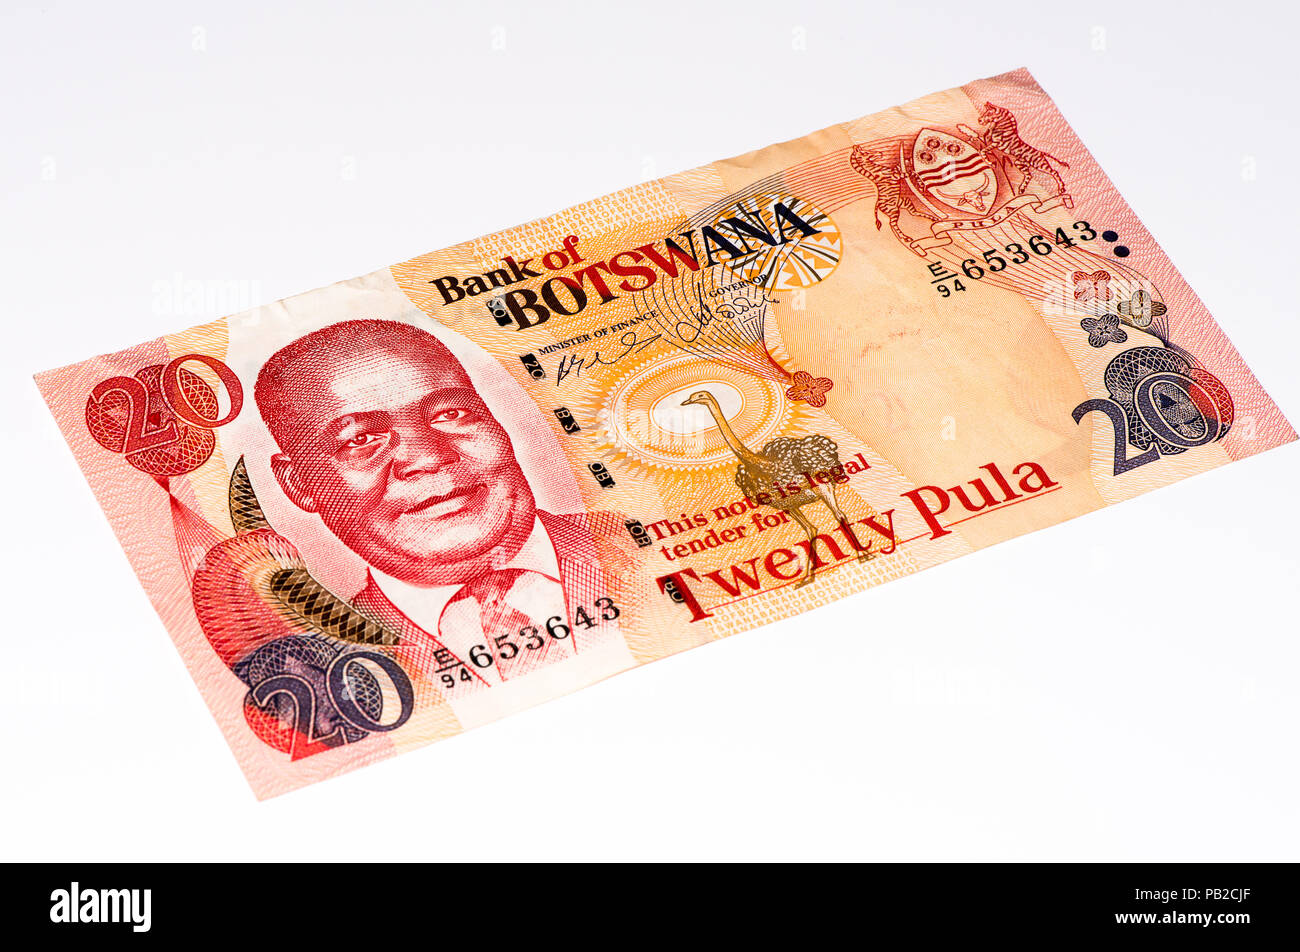 Pula Botswana Currency Stock Photos & Pula Botswana Currency